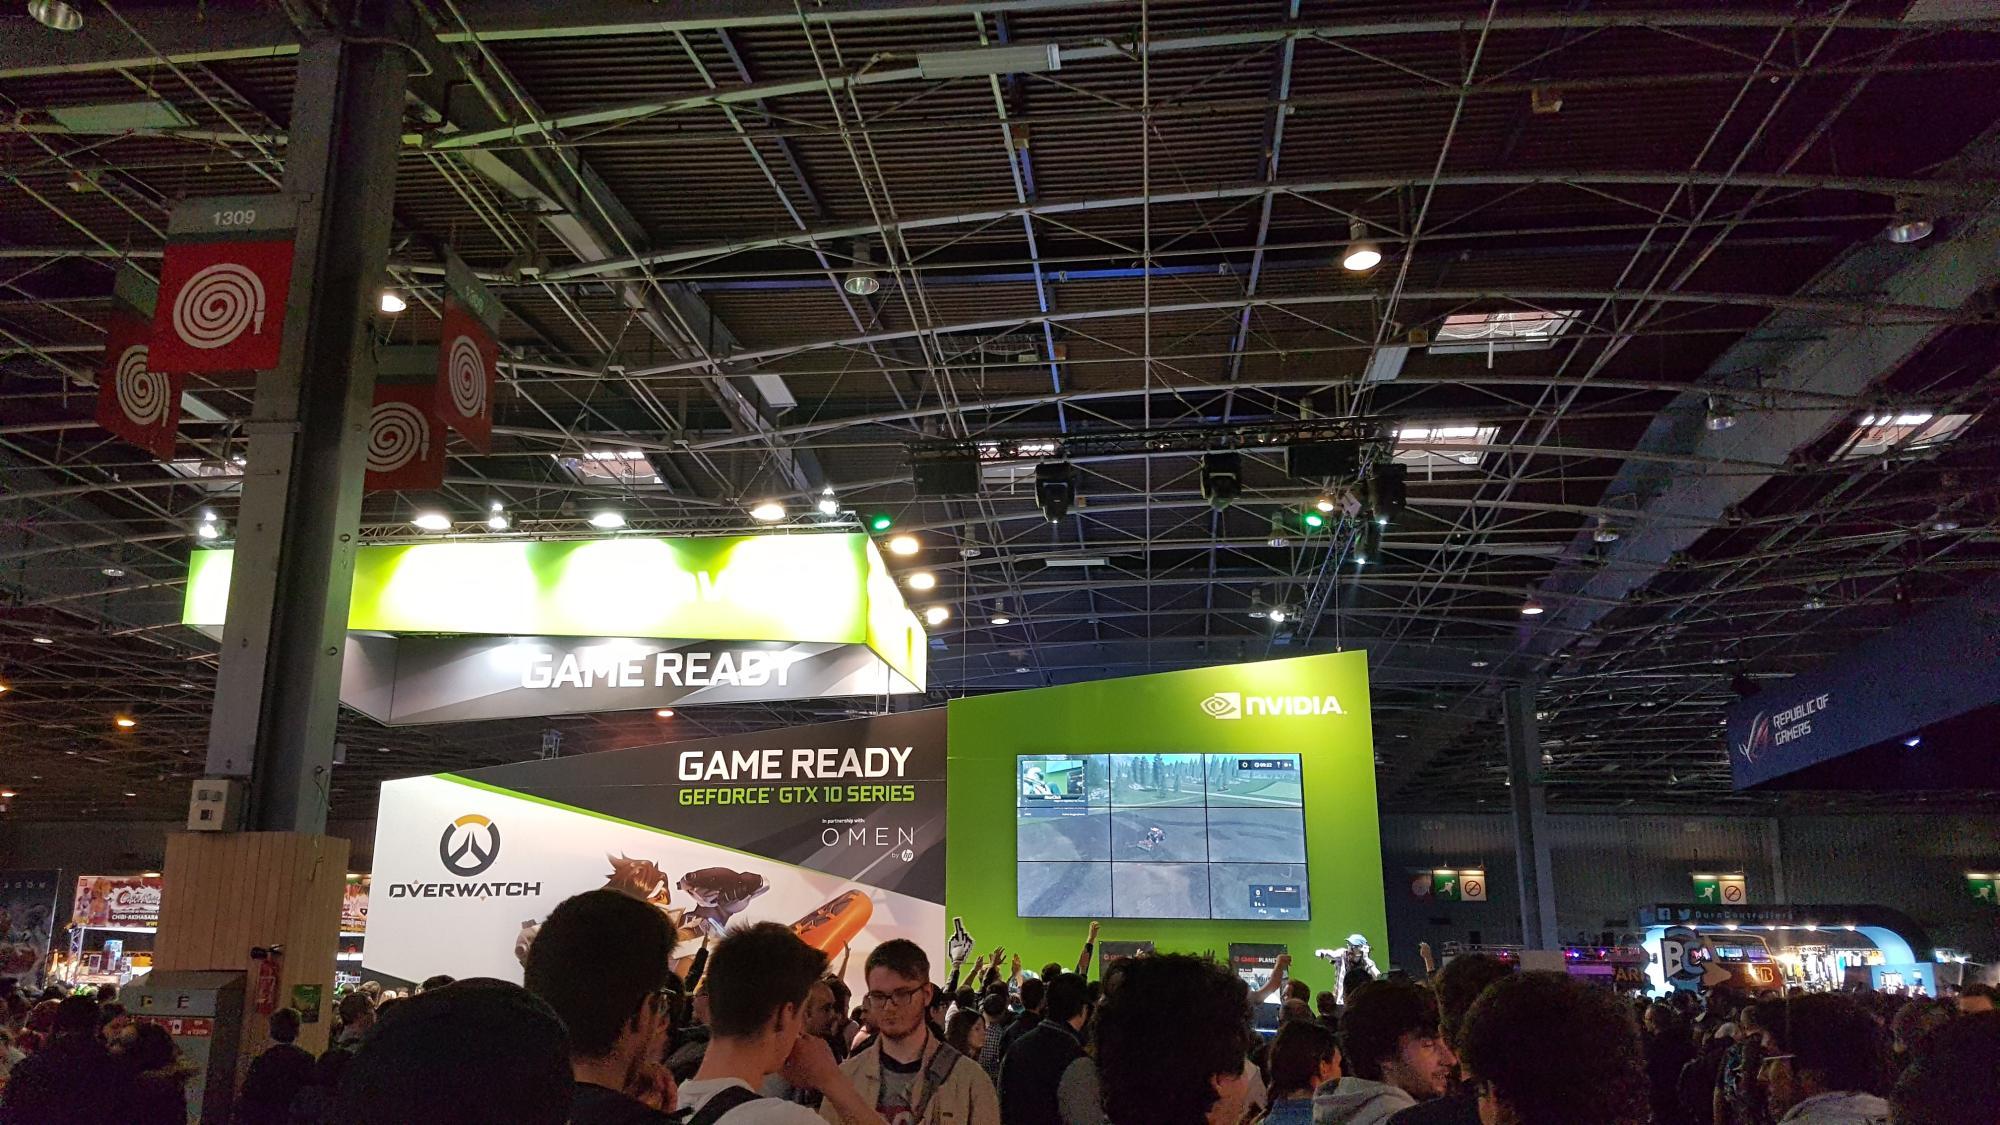 Paris Games Week 2016 - Hymelia .eJwNysENwyAMAMBdGABjg4FkmQoRRFIlBYHzqrp787rPfdU9TrWqXaTPFWA7Zm5j01PaSLXo2lo9S-rH1LldkERS3q_ykQkYMFo0ZE0MSM5FA-TIk2VHzMGgN56BHp-0vNDyYlm_e1W_P_23Its